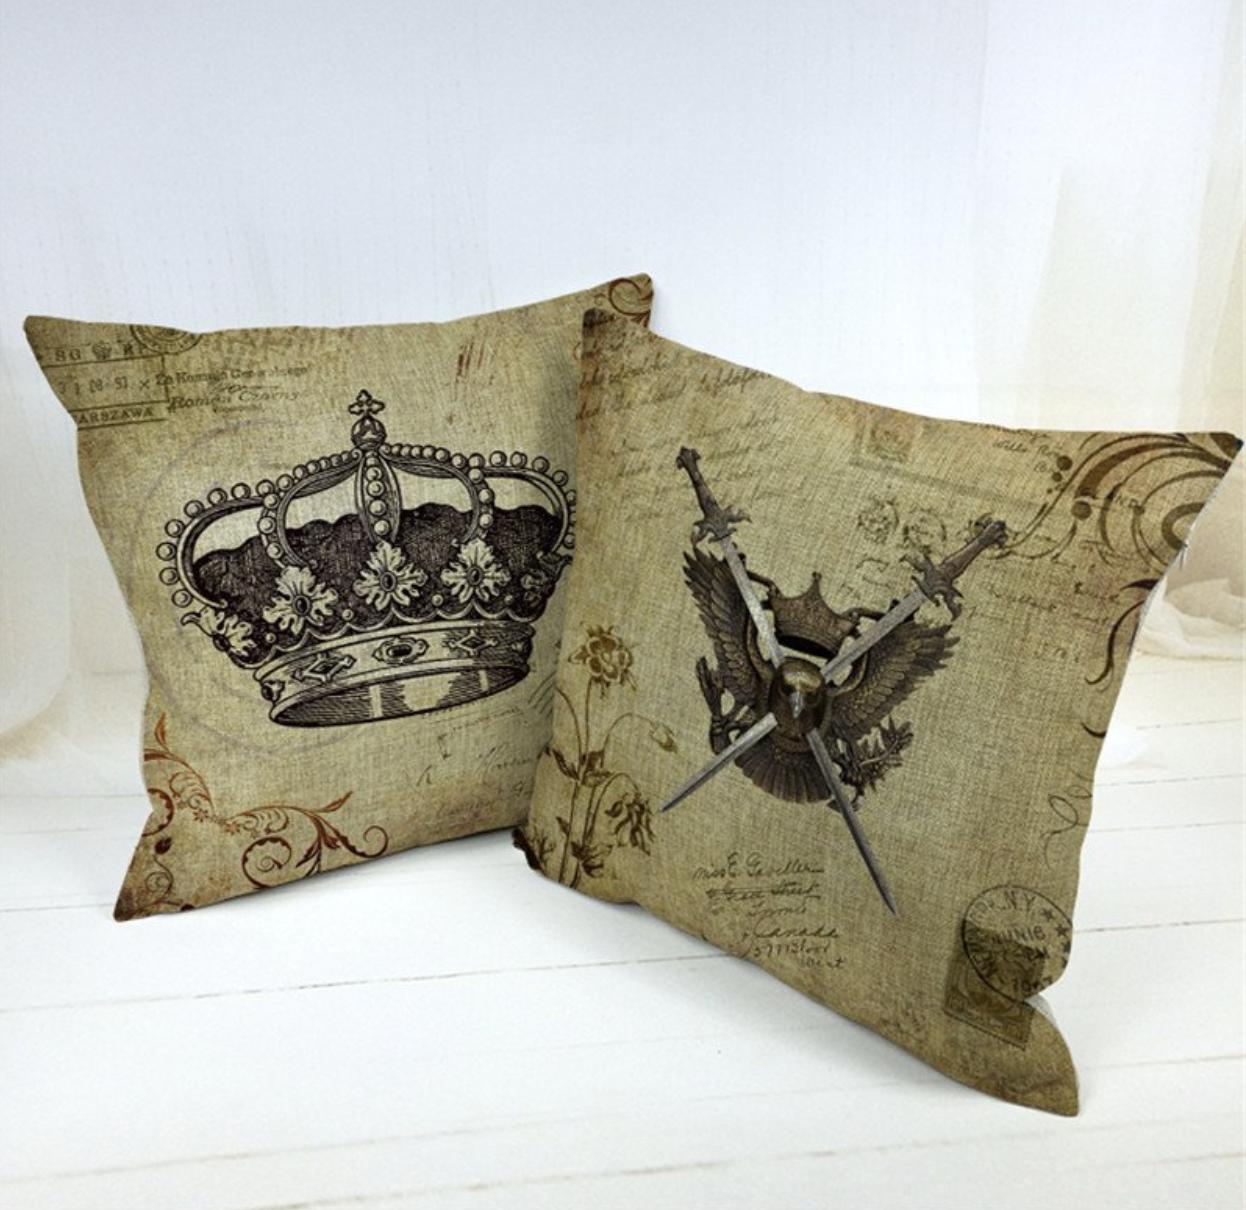 Vintage crown and eagle swords vintage pillow covers pinterest